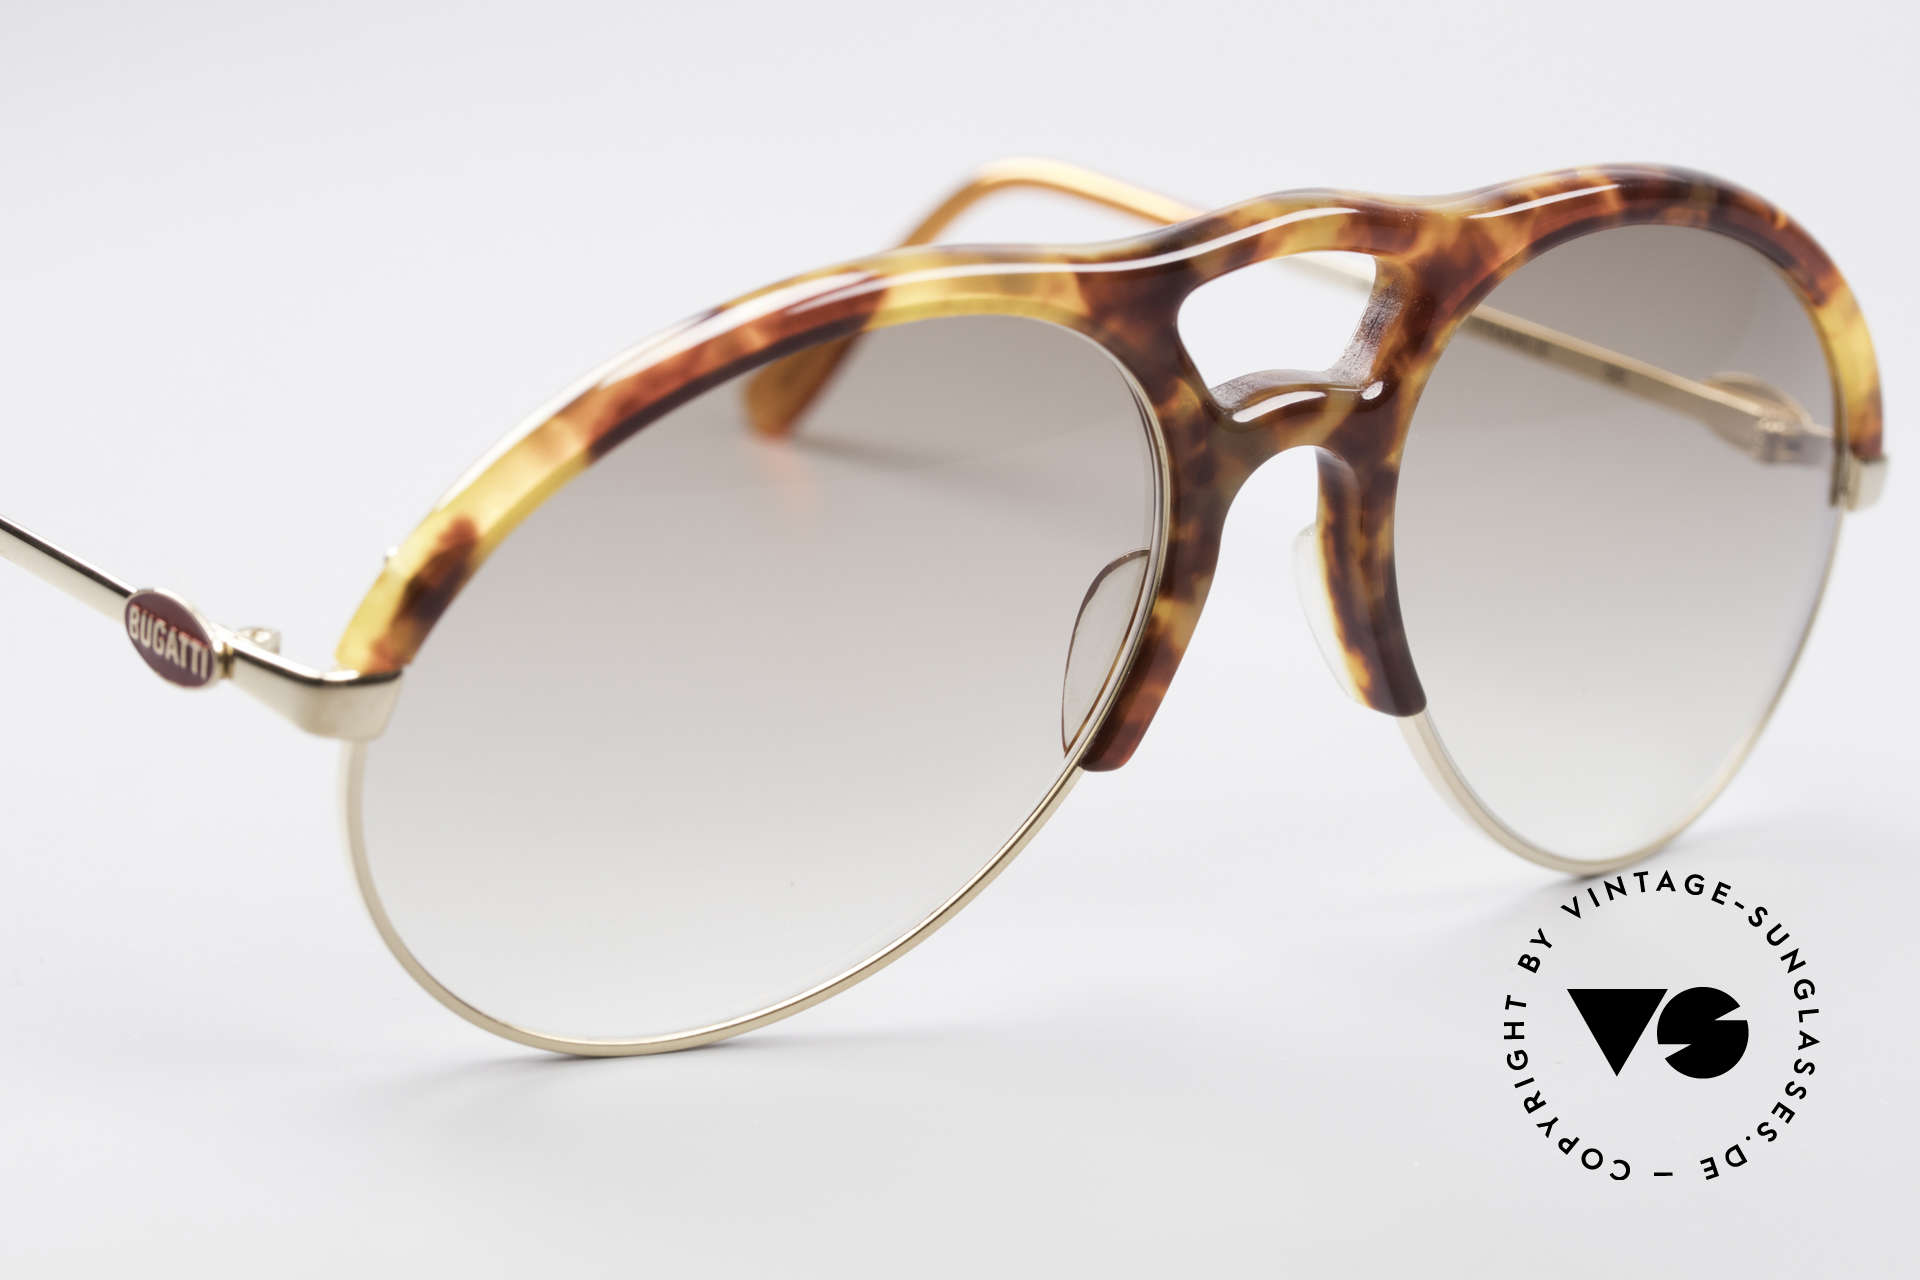 Bugatti 64900 Tortoise Optic 80's Glasses, new old stock (like all our old BUGATTI ORIGINALS), Made for Men